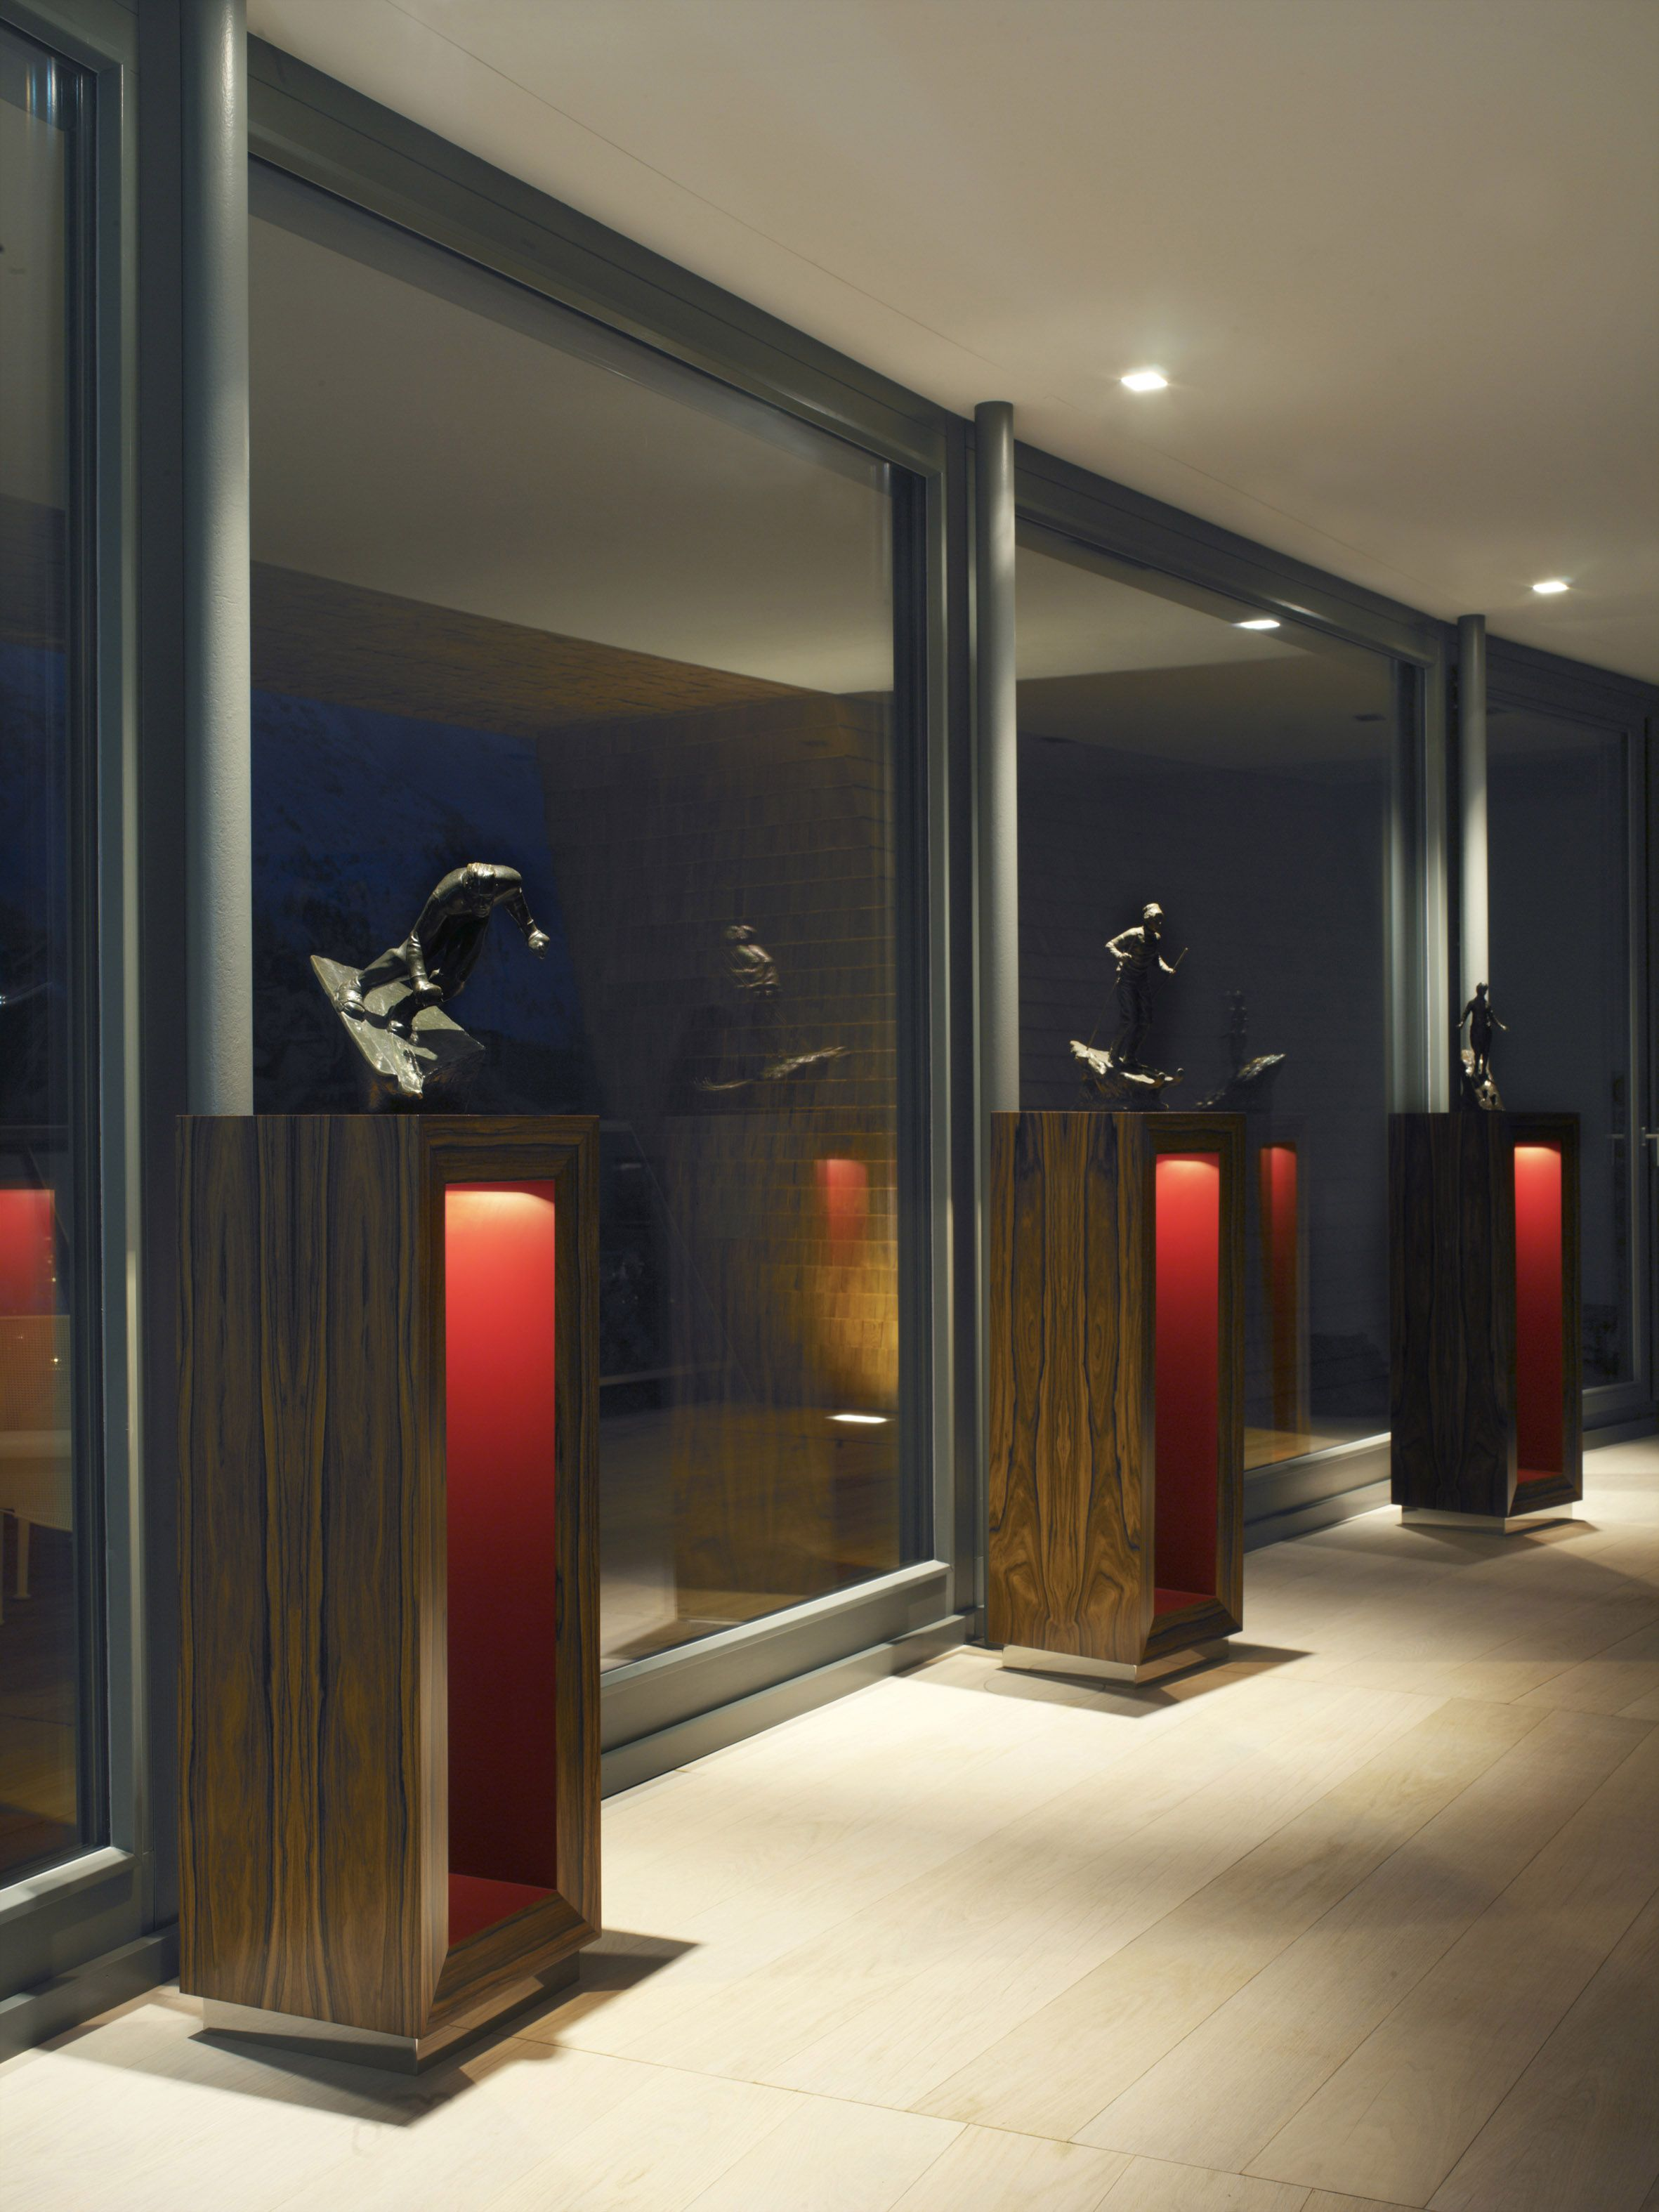 Luxury Chalet Norman Foster St Moritz Switzerland Ski  # Muebles Norman Foster